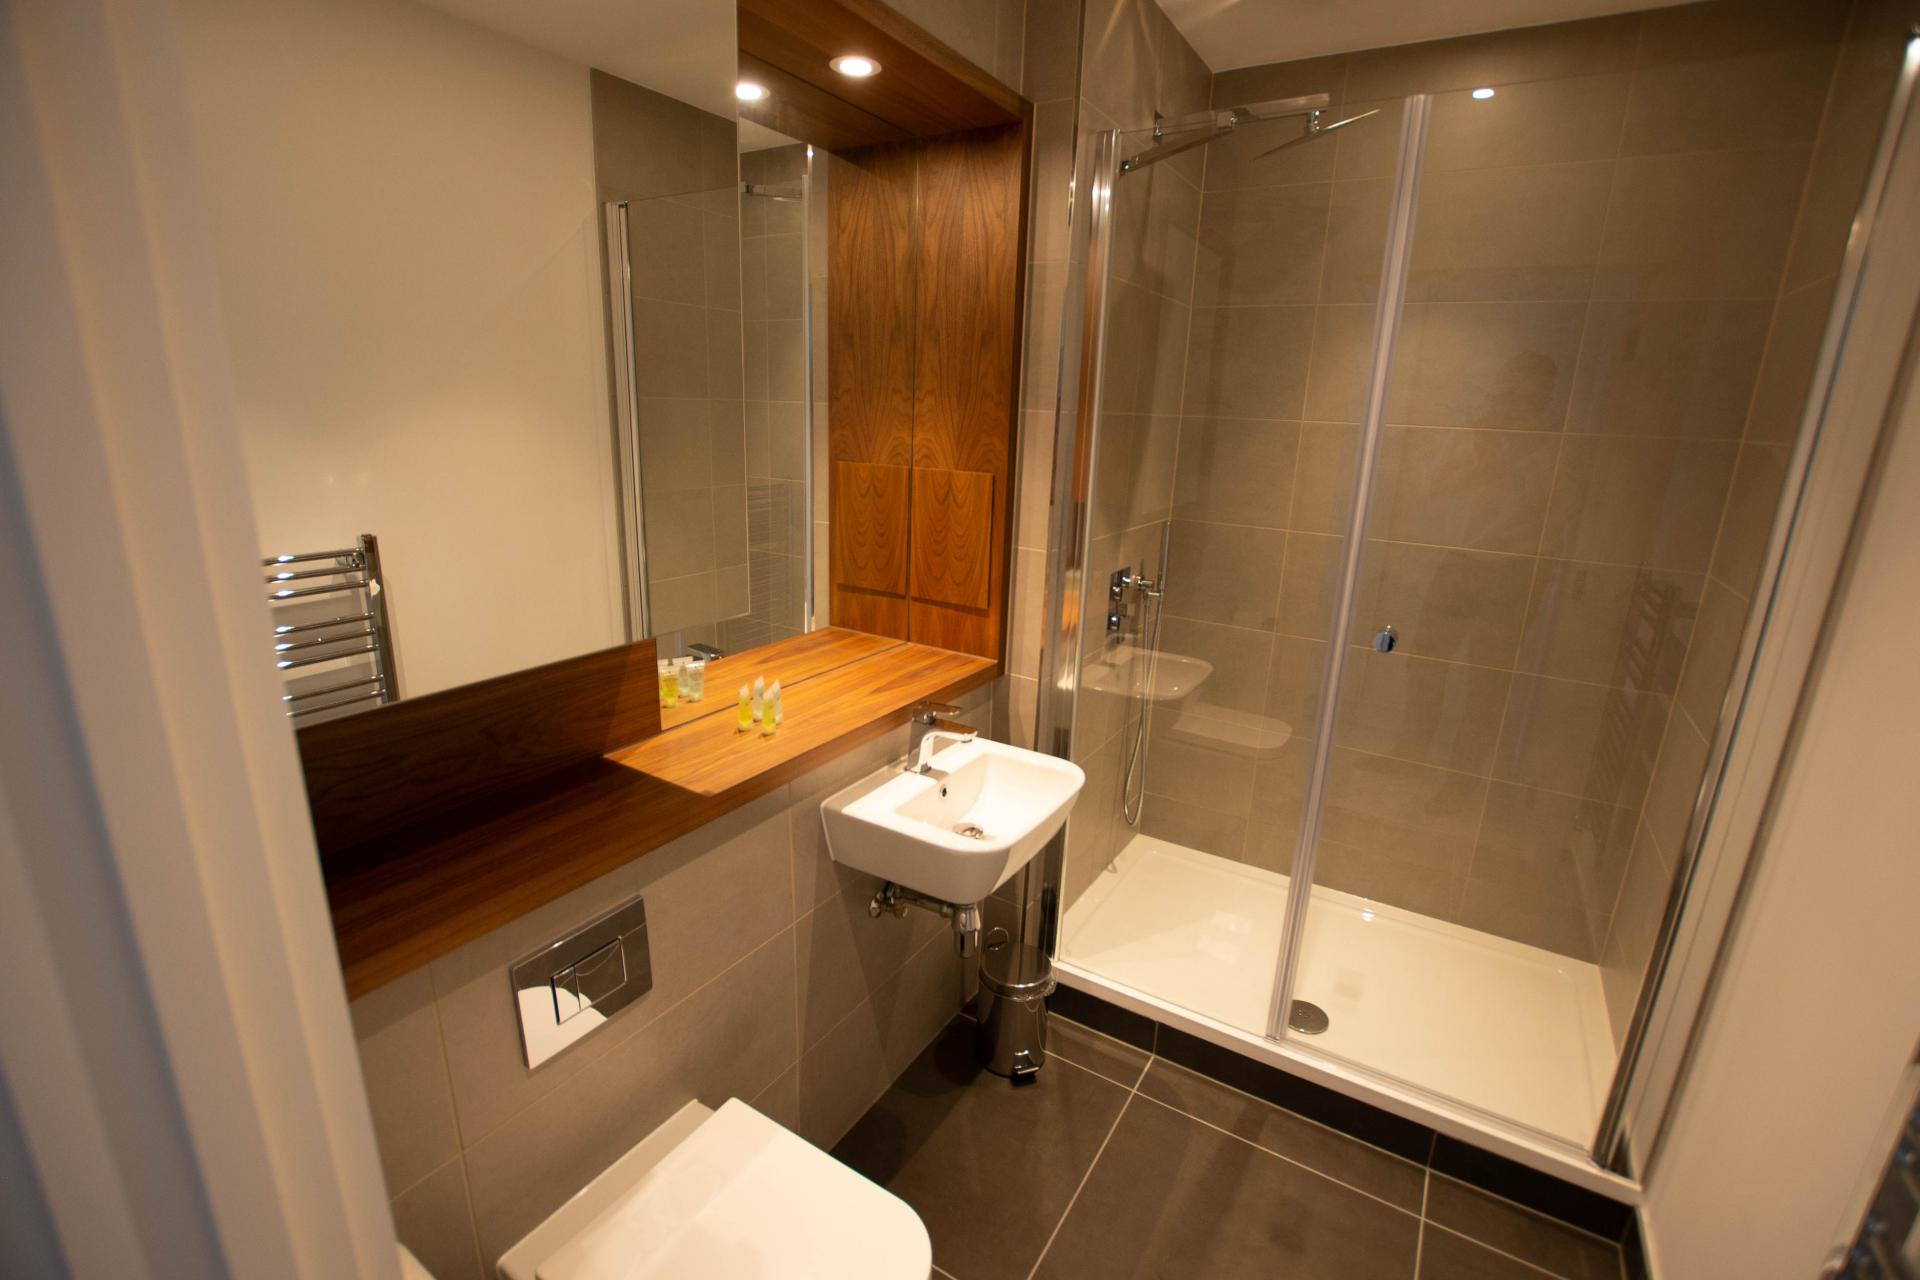 Bathroom at Canary Wharf Apartments By Charles Hope, Canary Wharf, London - Citybase Apartments